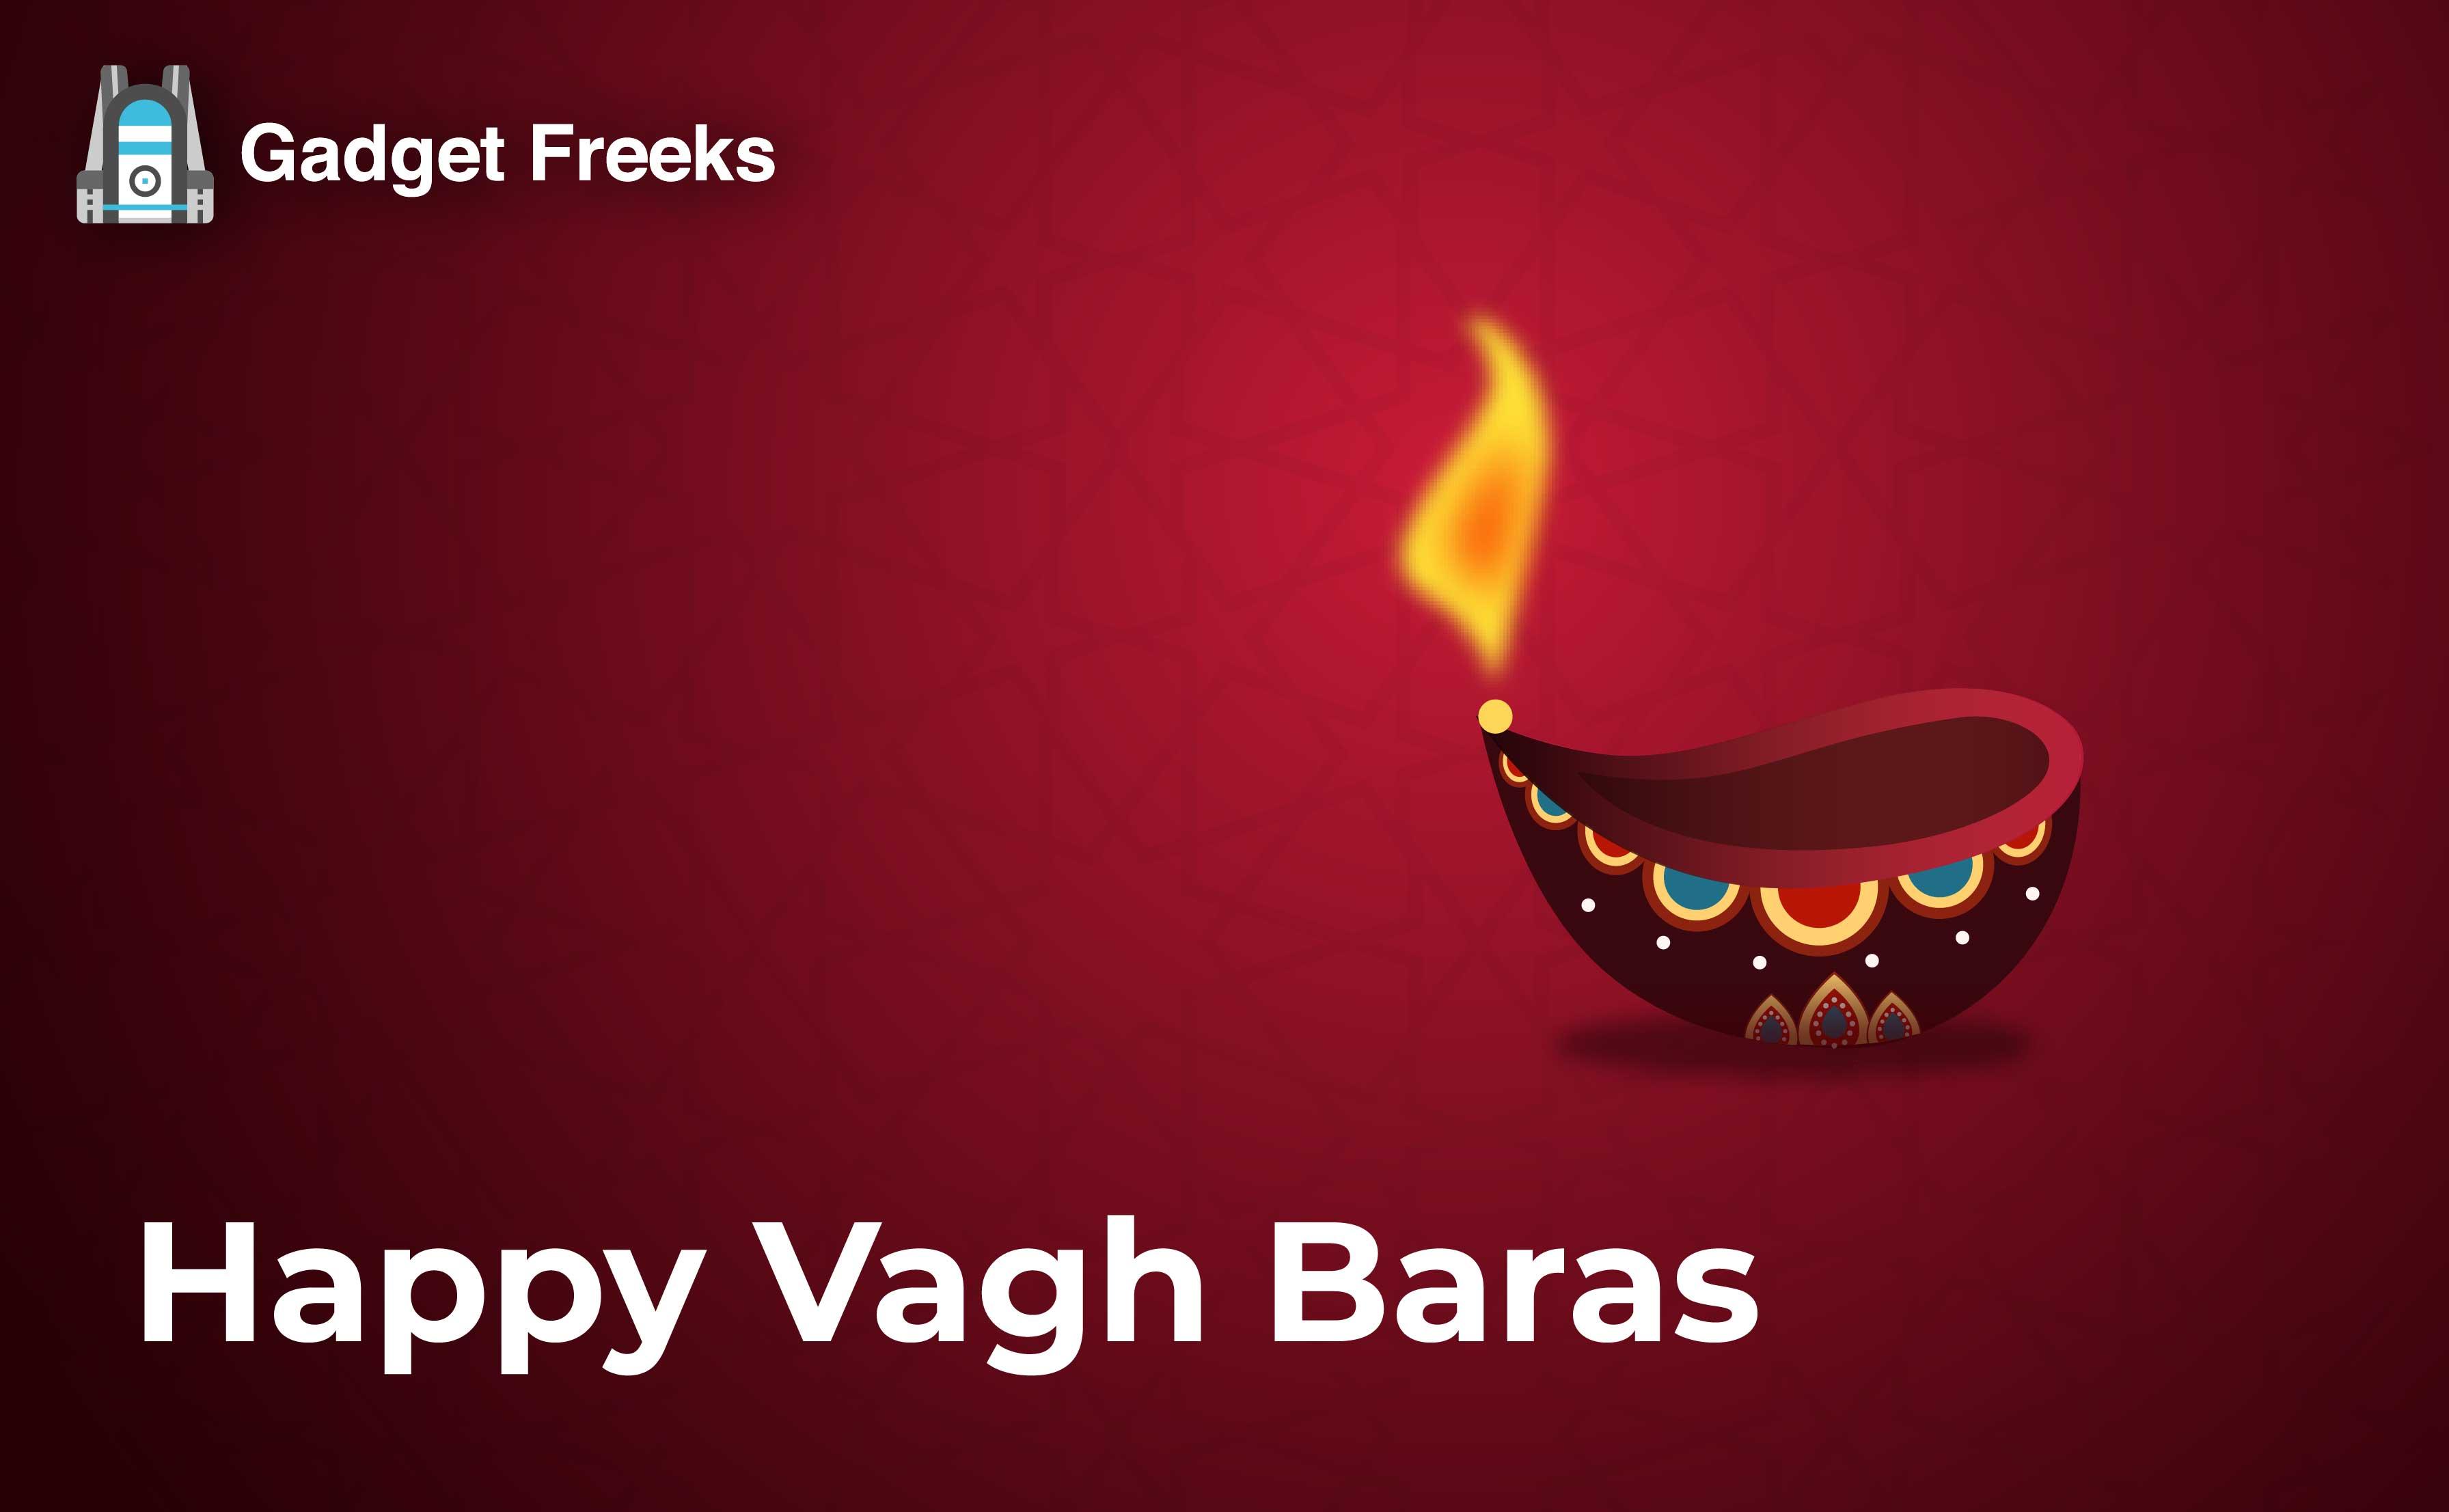 Vasu Baras Images